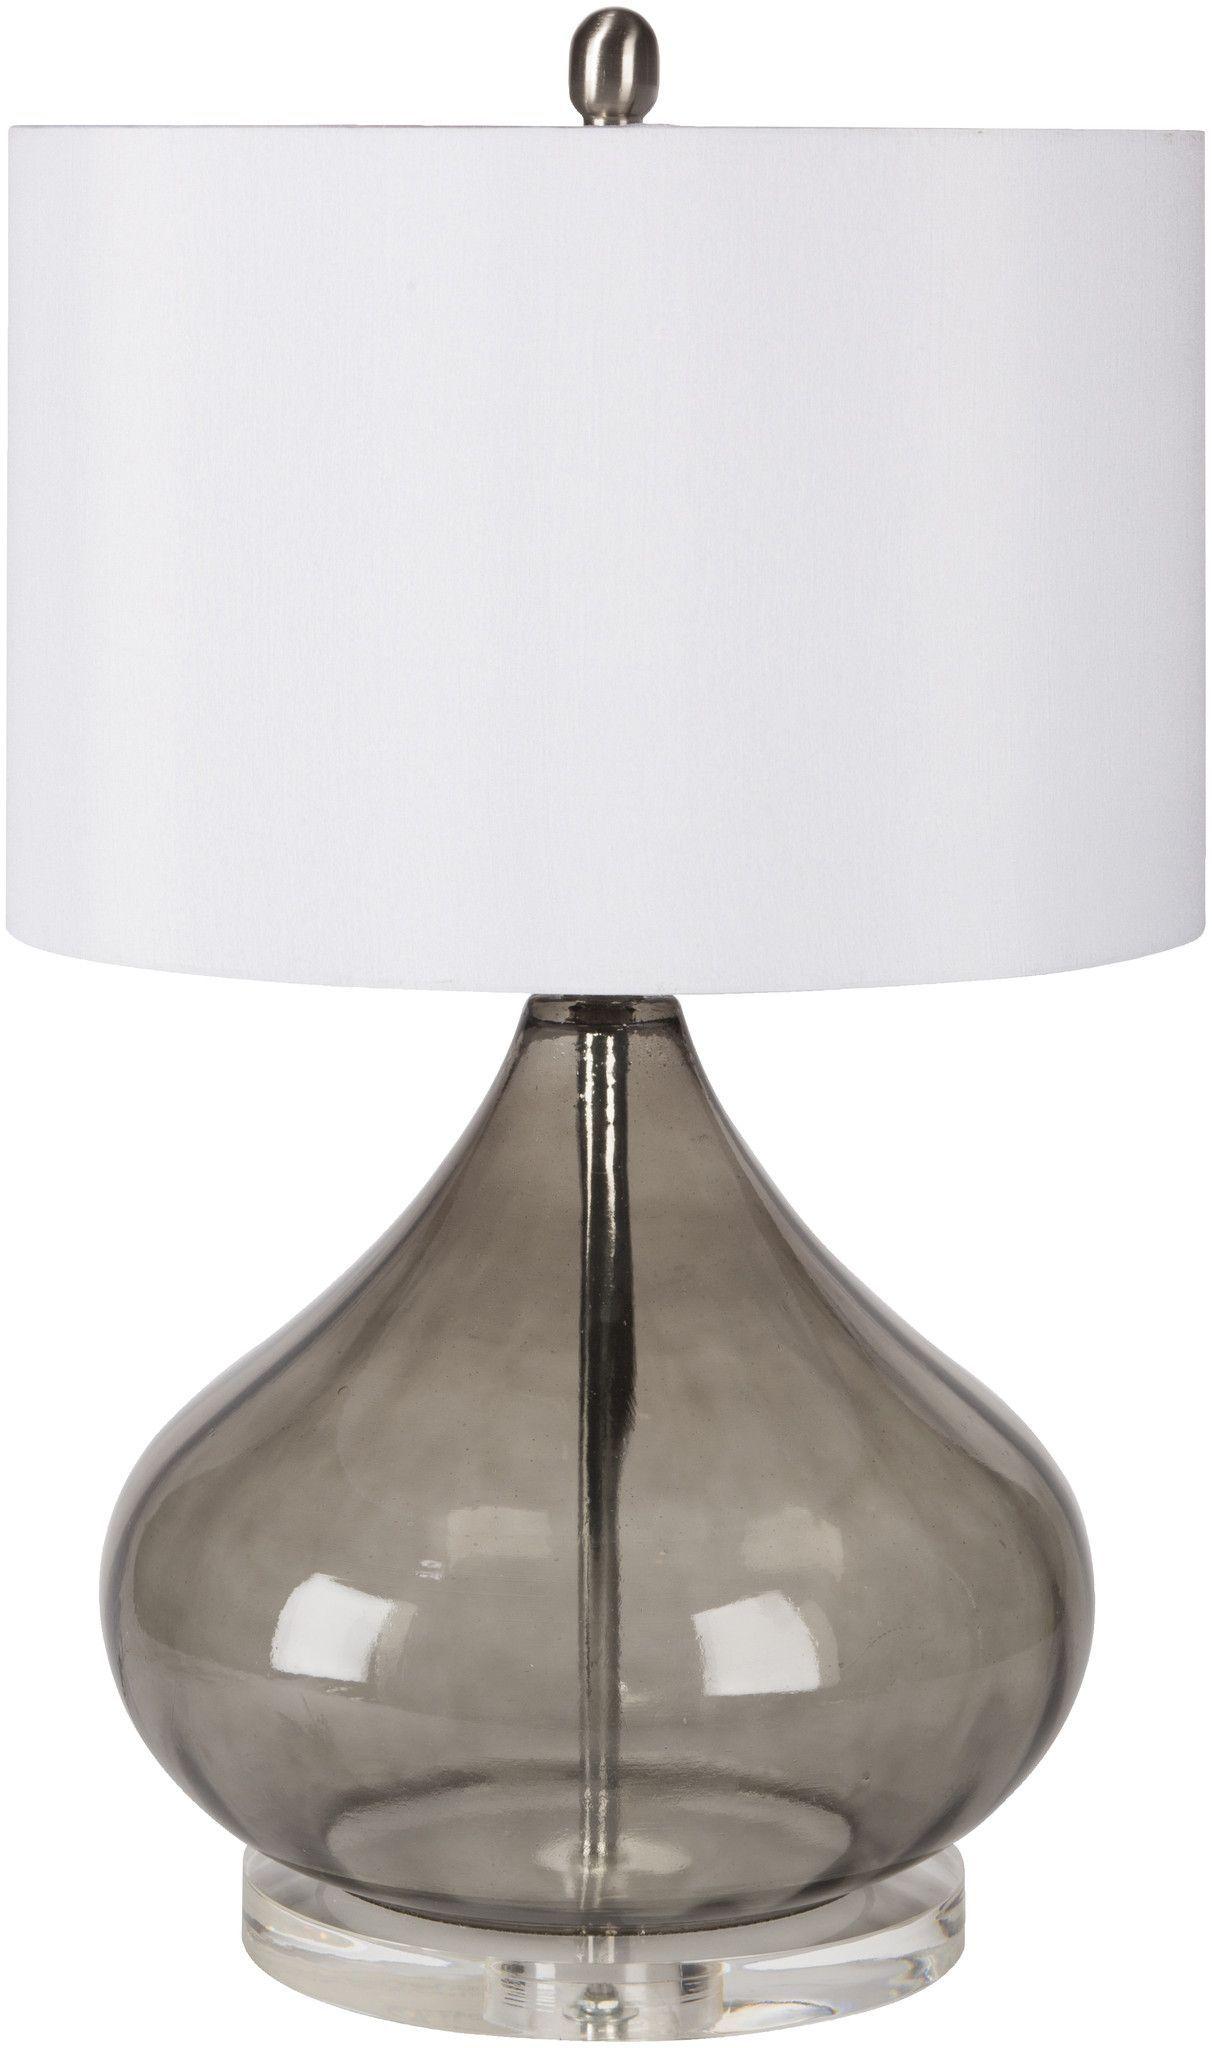 Pyrus Coastal Table Lamp Transparent Smoke White